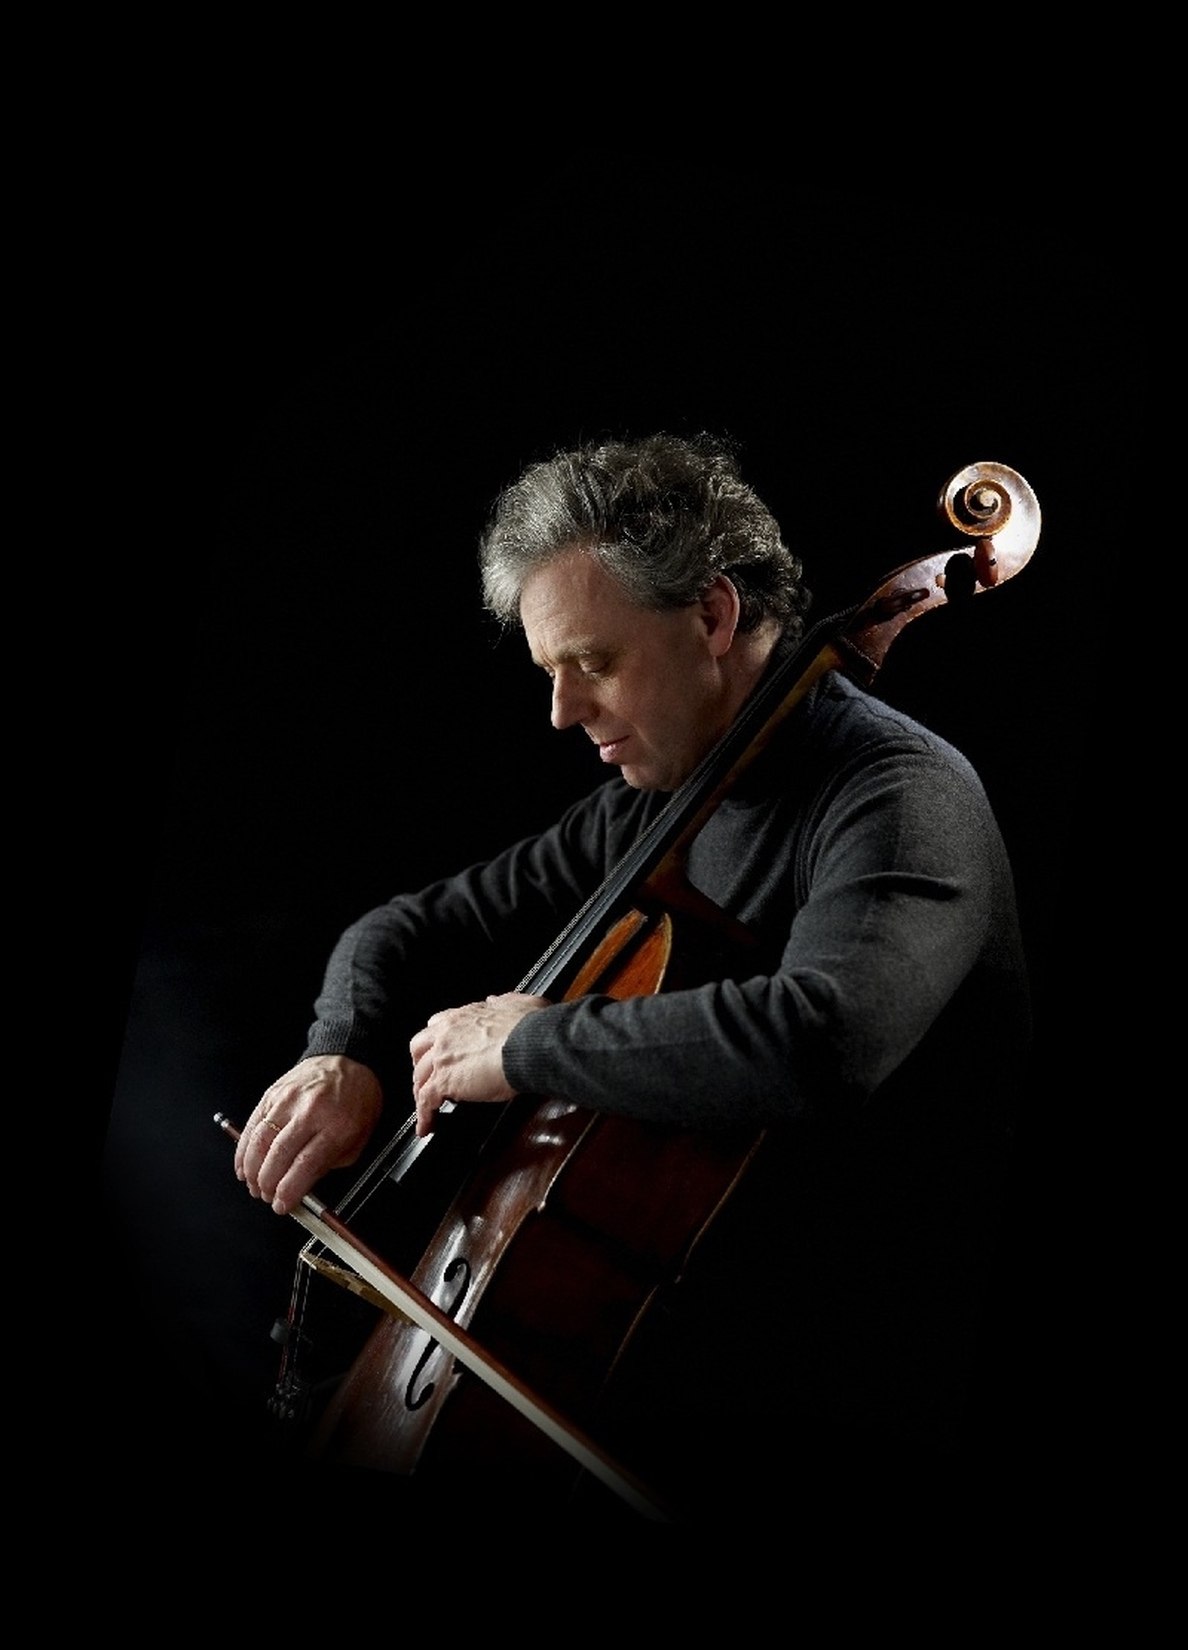 El violonchelista Julius Berger cerrará el 34º Festival de Música Pau Casals